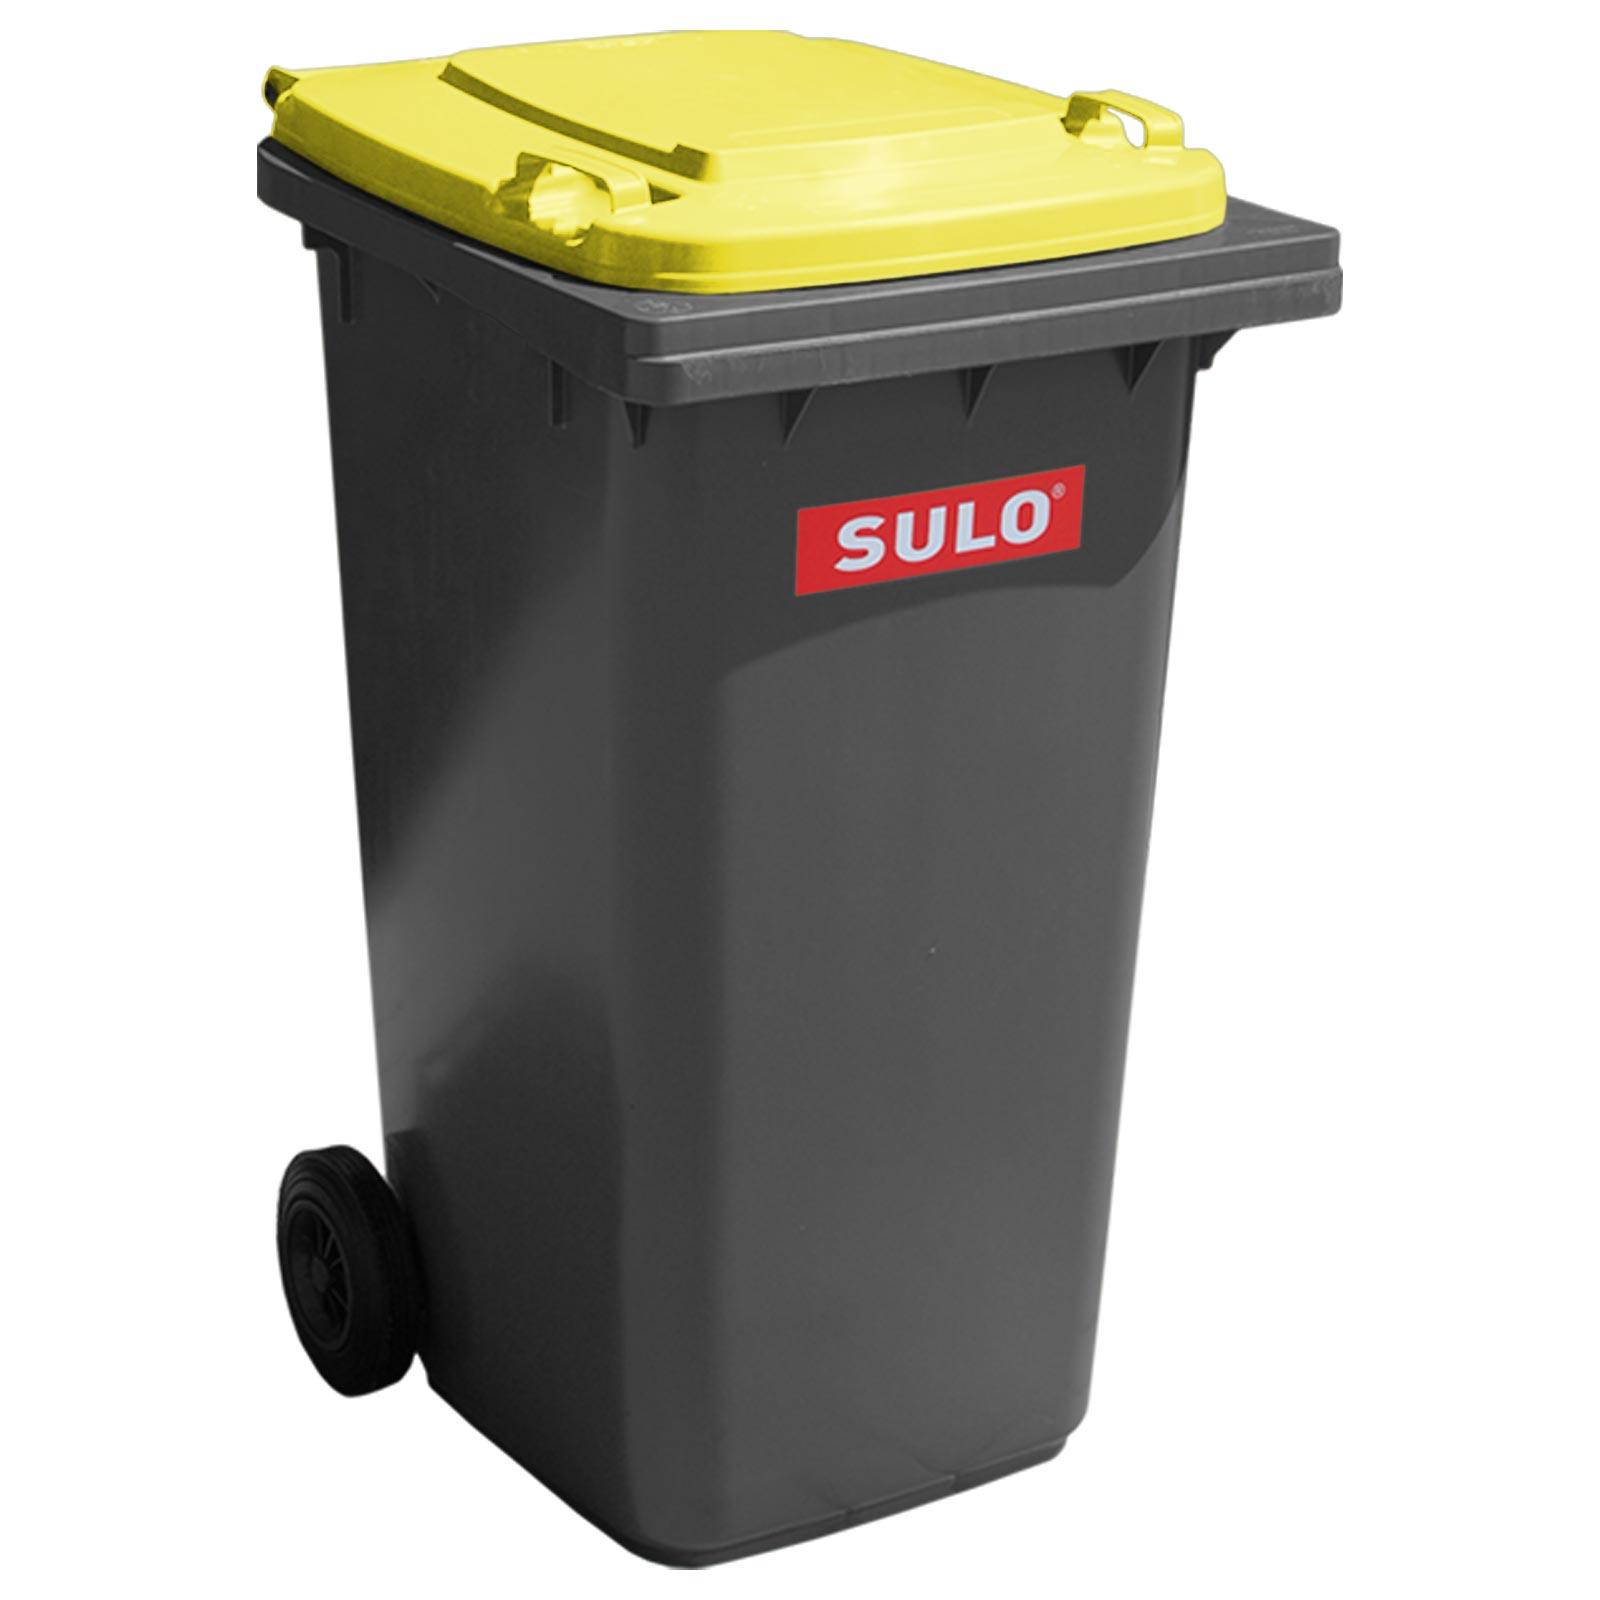 Original SULO 80 L Mülltonne grau gelber Deckel Abfalltonne Mülleimer